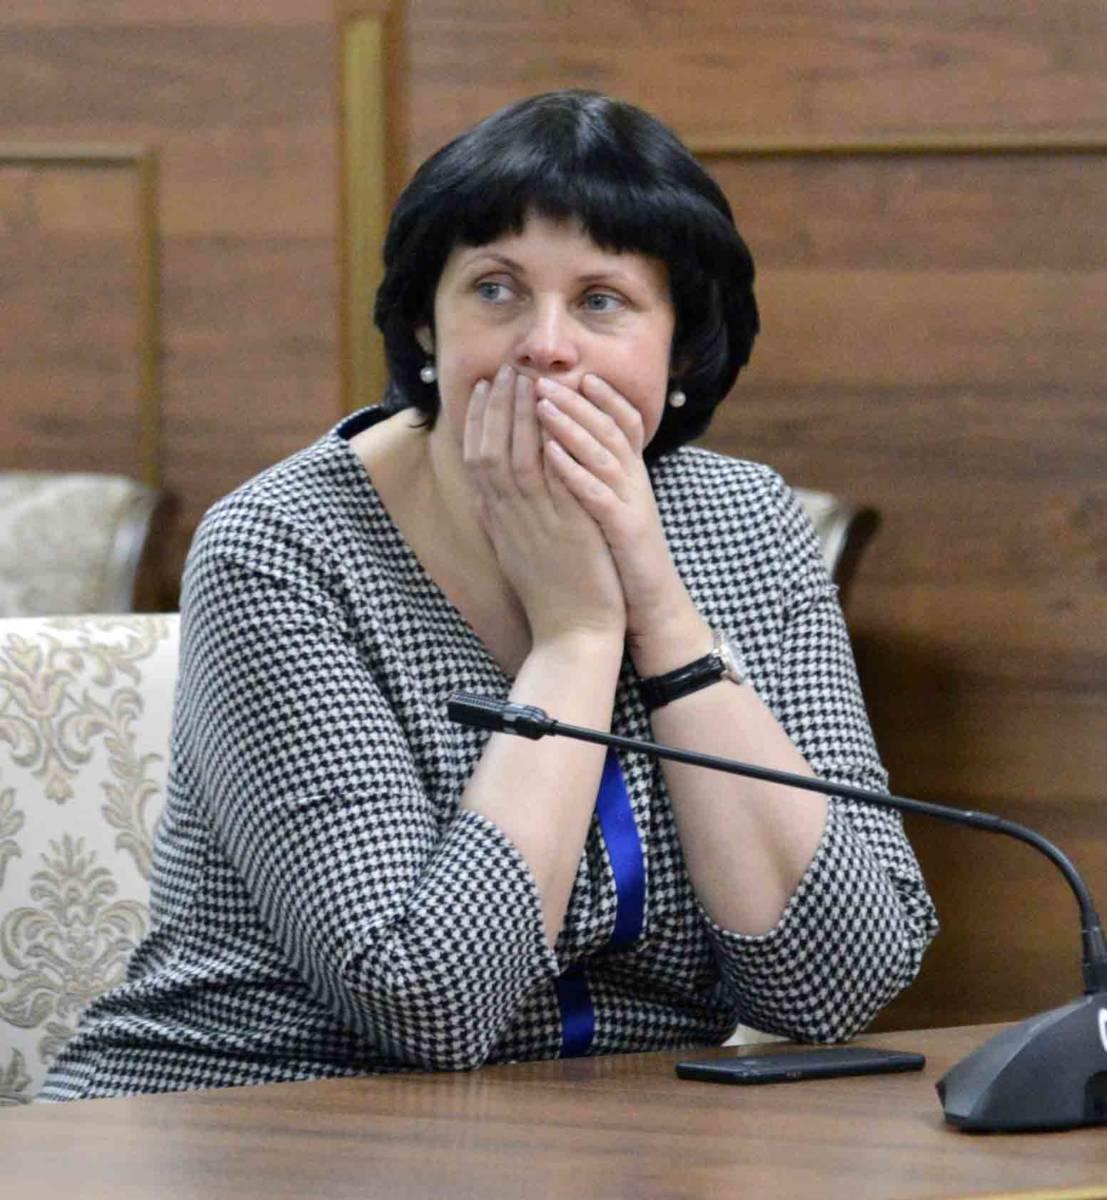 Афанасьевой не хватало свободы